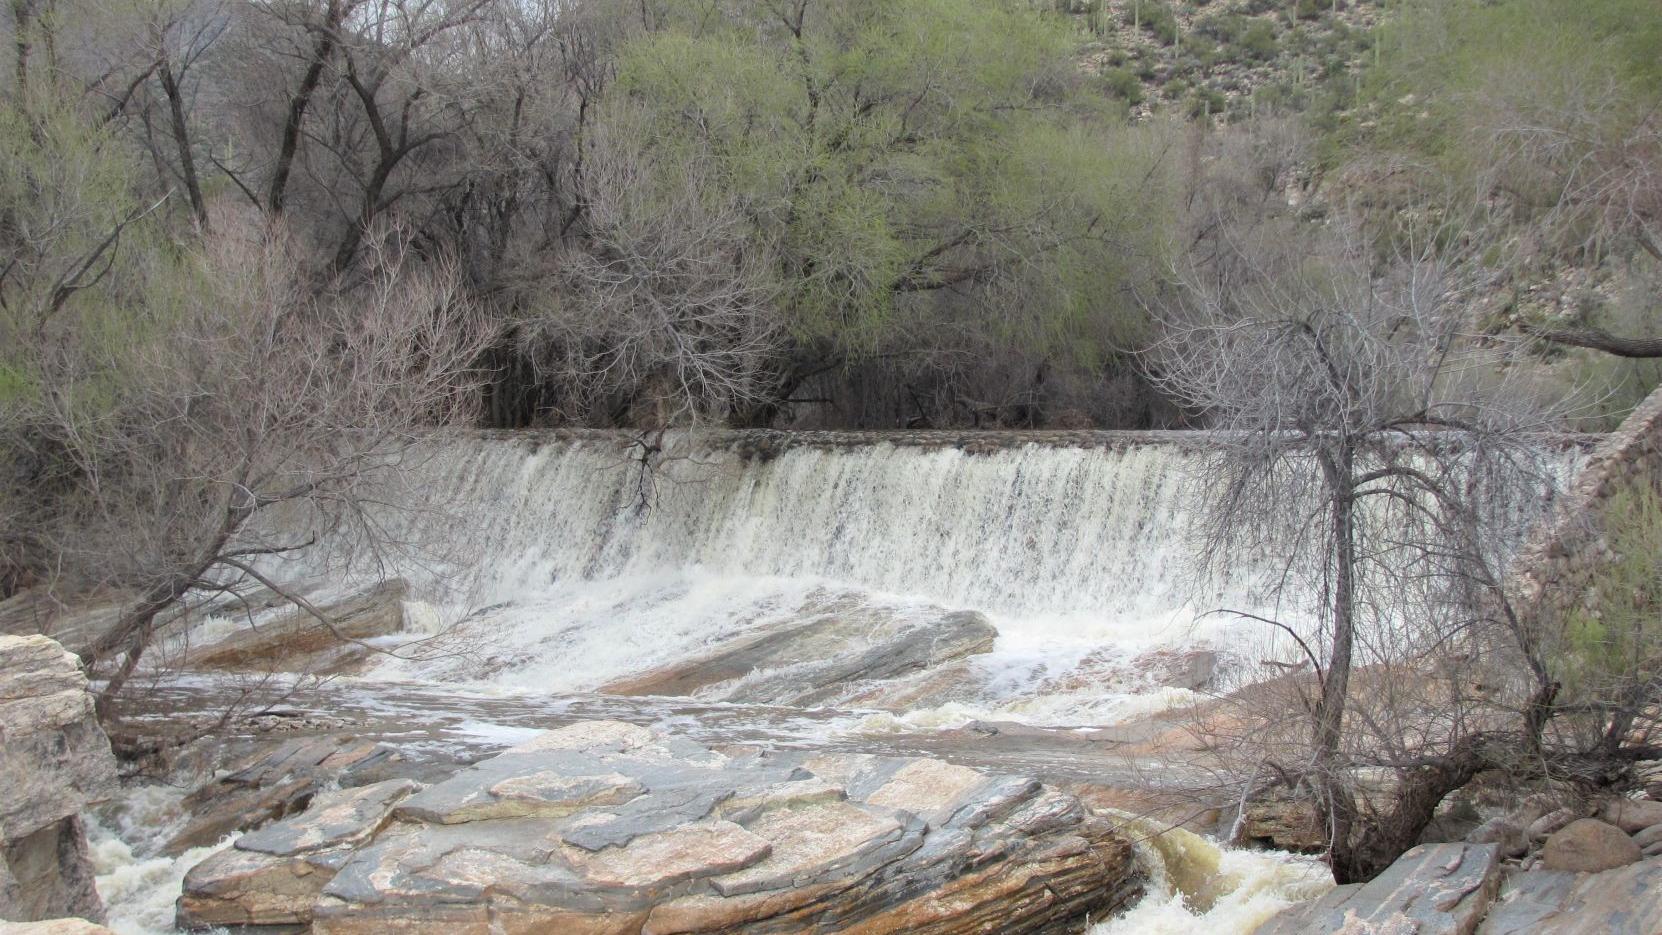 Sabino Creek gushing, wildflowers are blooming in canyon